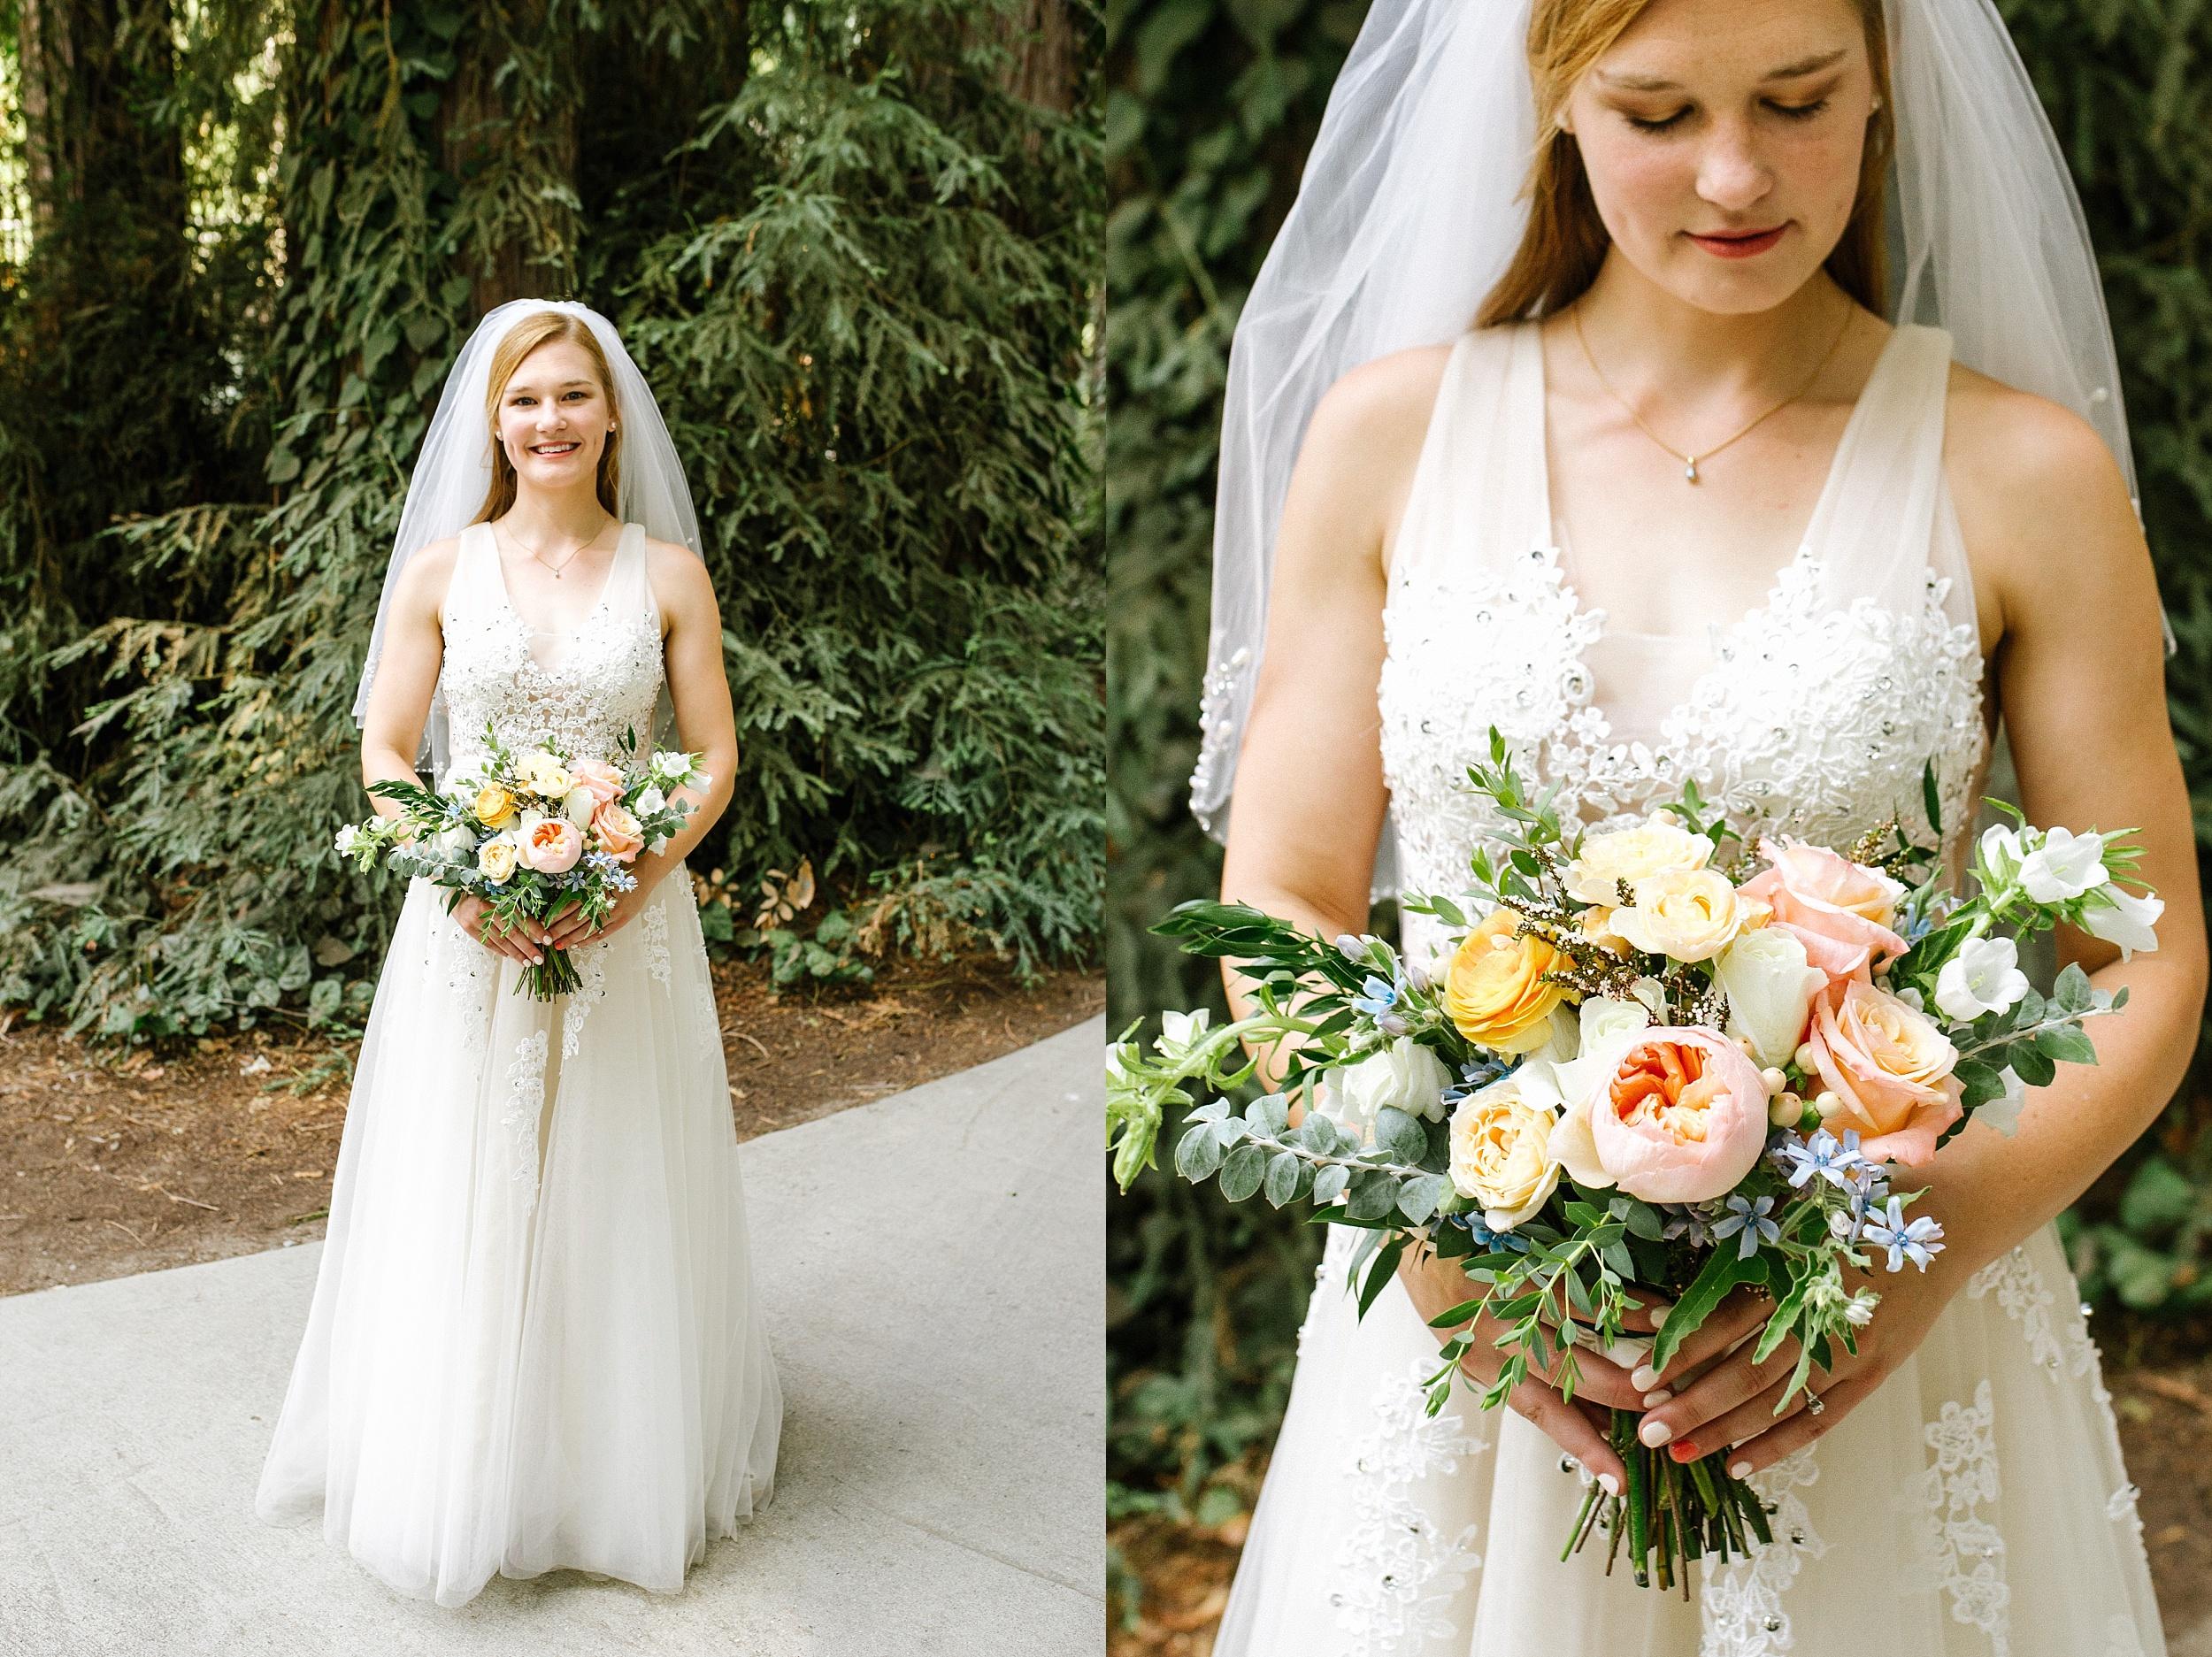 Amphitheatre-of-the-Redwoods-wedding-erikariley_chelsea-dier-photography_0015.jpg